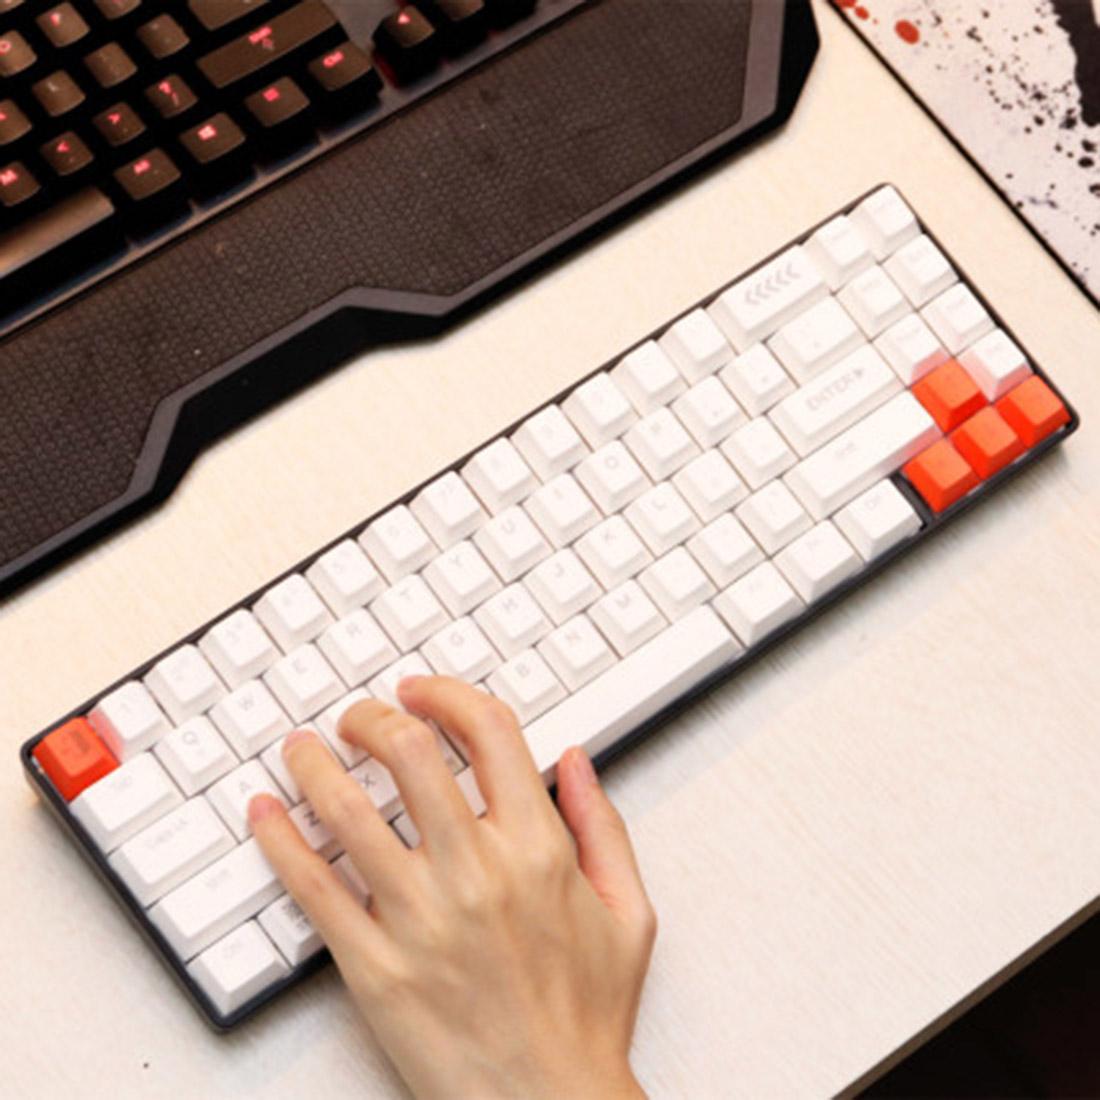 EK871 71 Keys PBT Keycaps Wireless 65% Mechanical Gaming Keyboard Compact Bluetooth Keyboard for Windows/Mac/Andoid